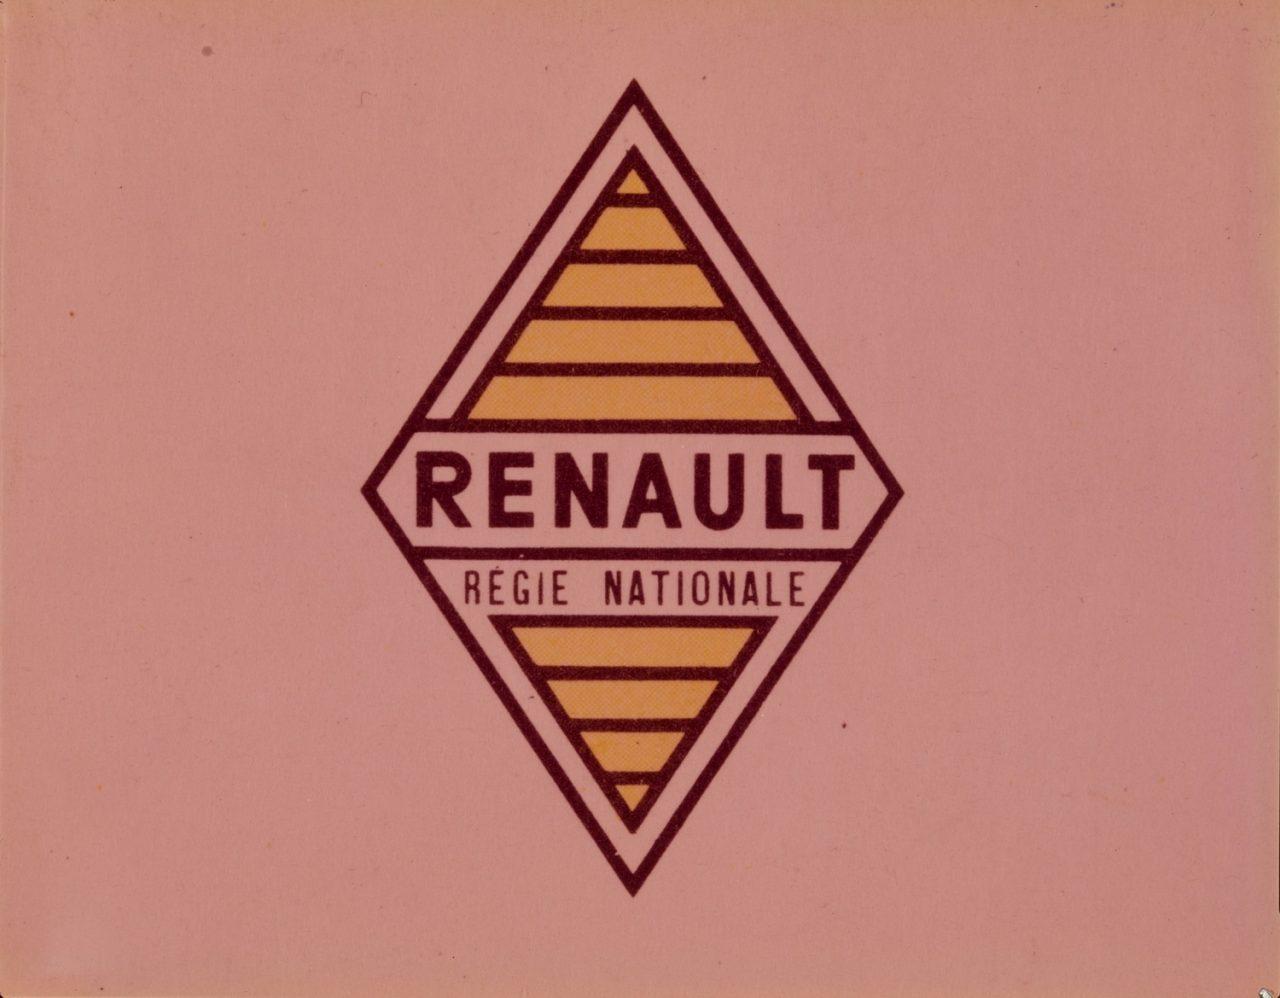 historia de Renault